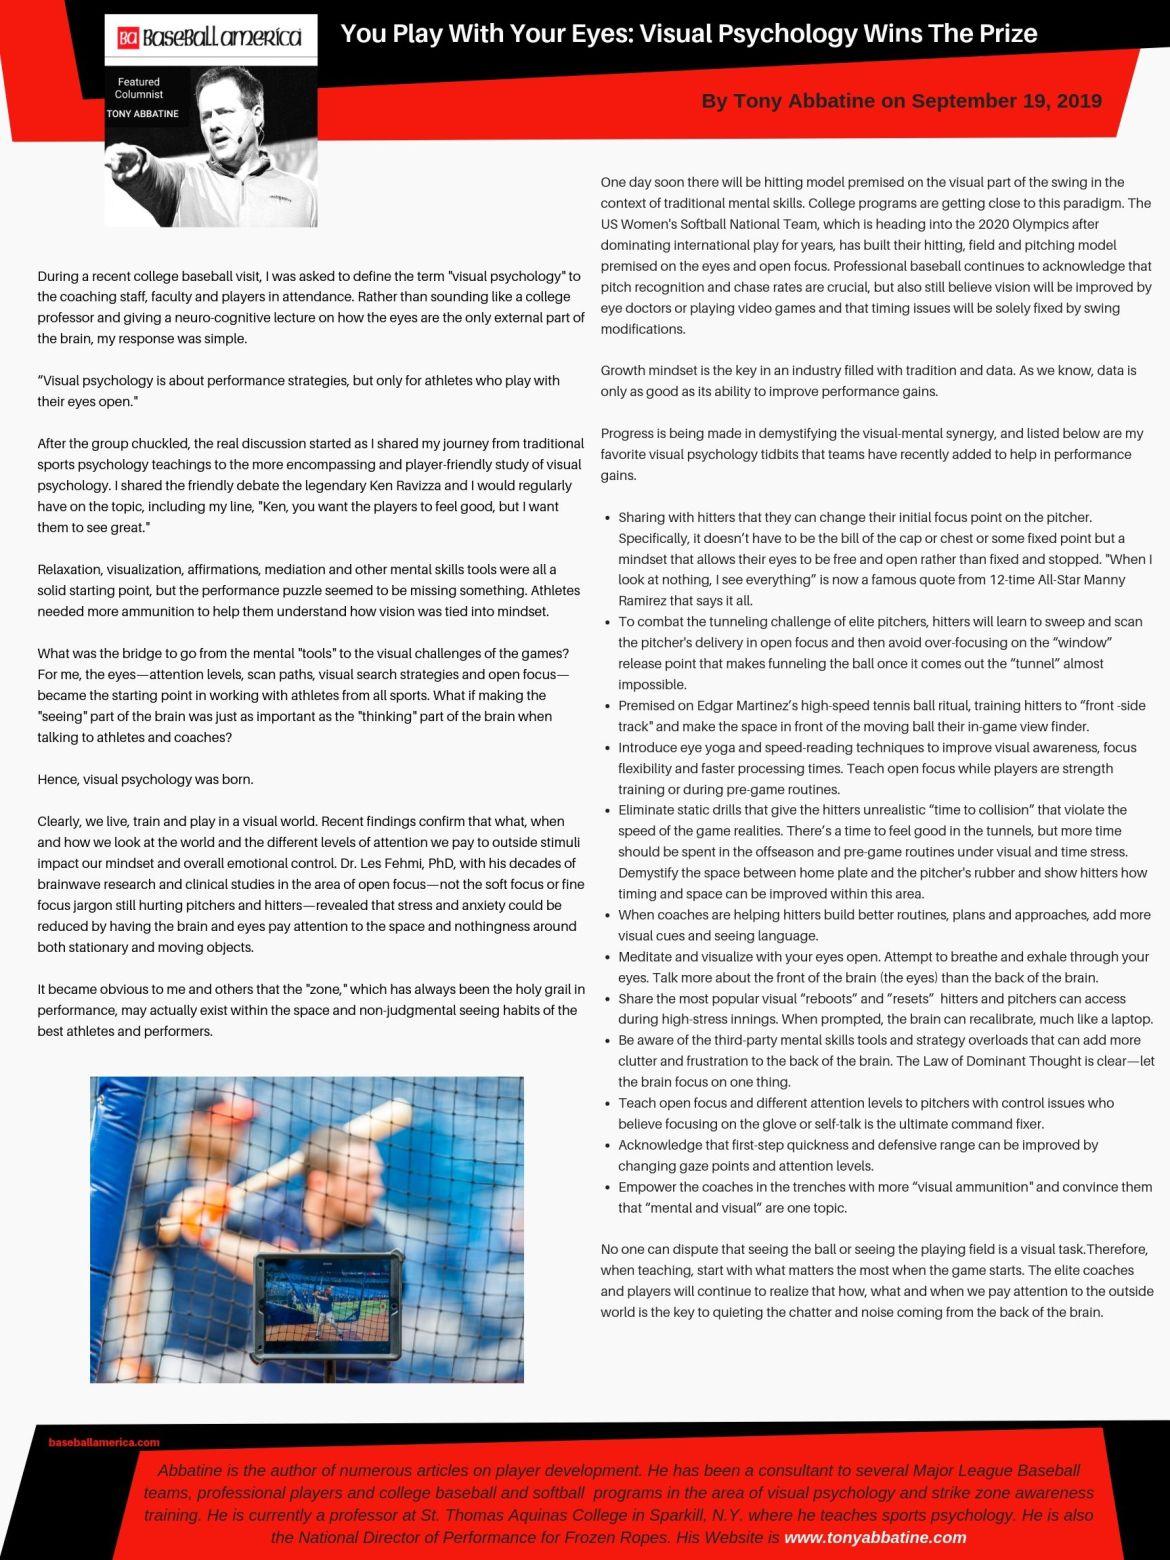 Tony Abbatine bi-weekly column in Baseball America: Visual Psych Wins the Prize